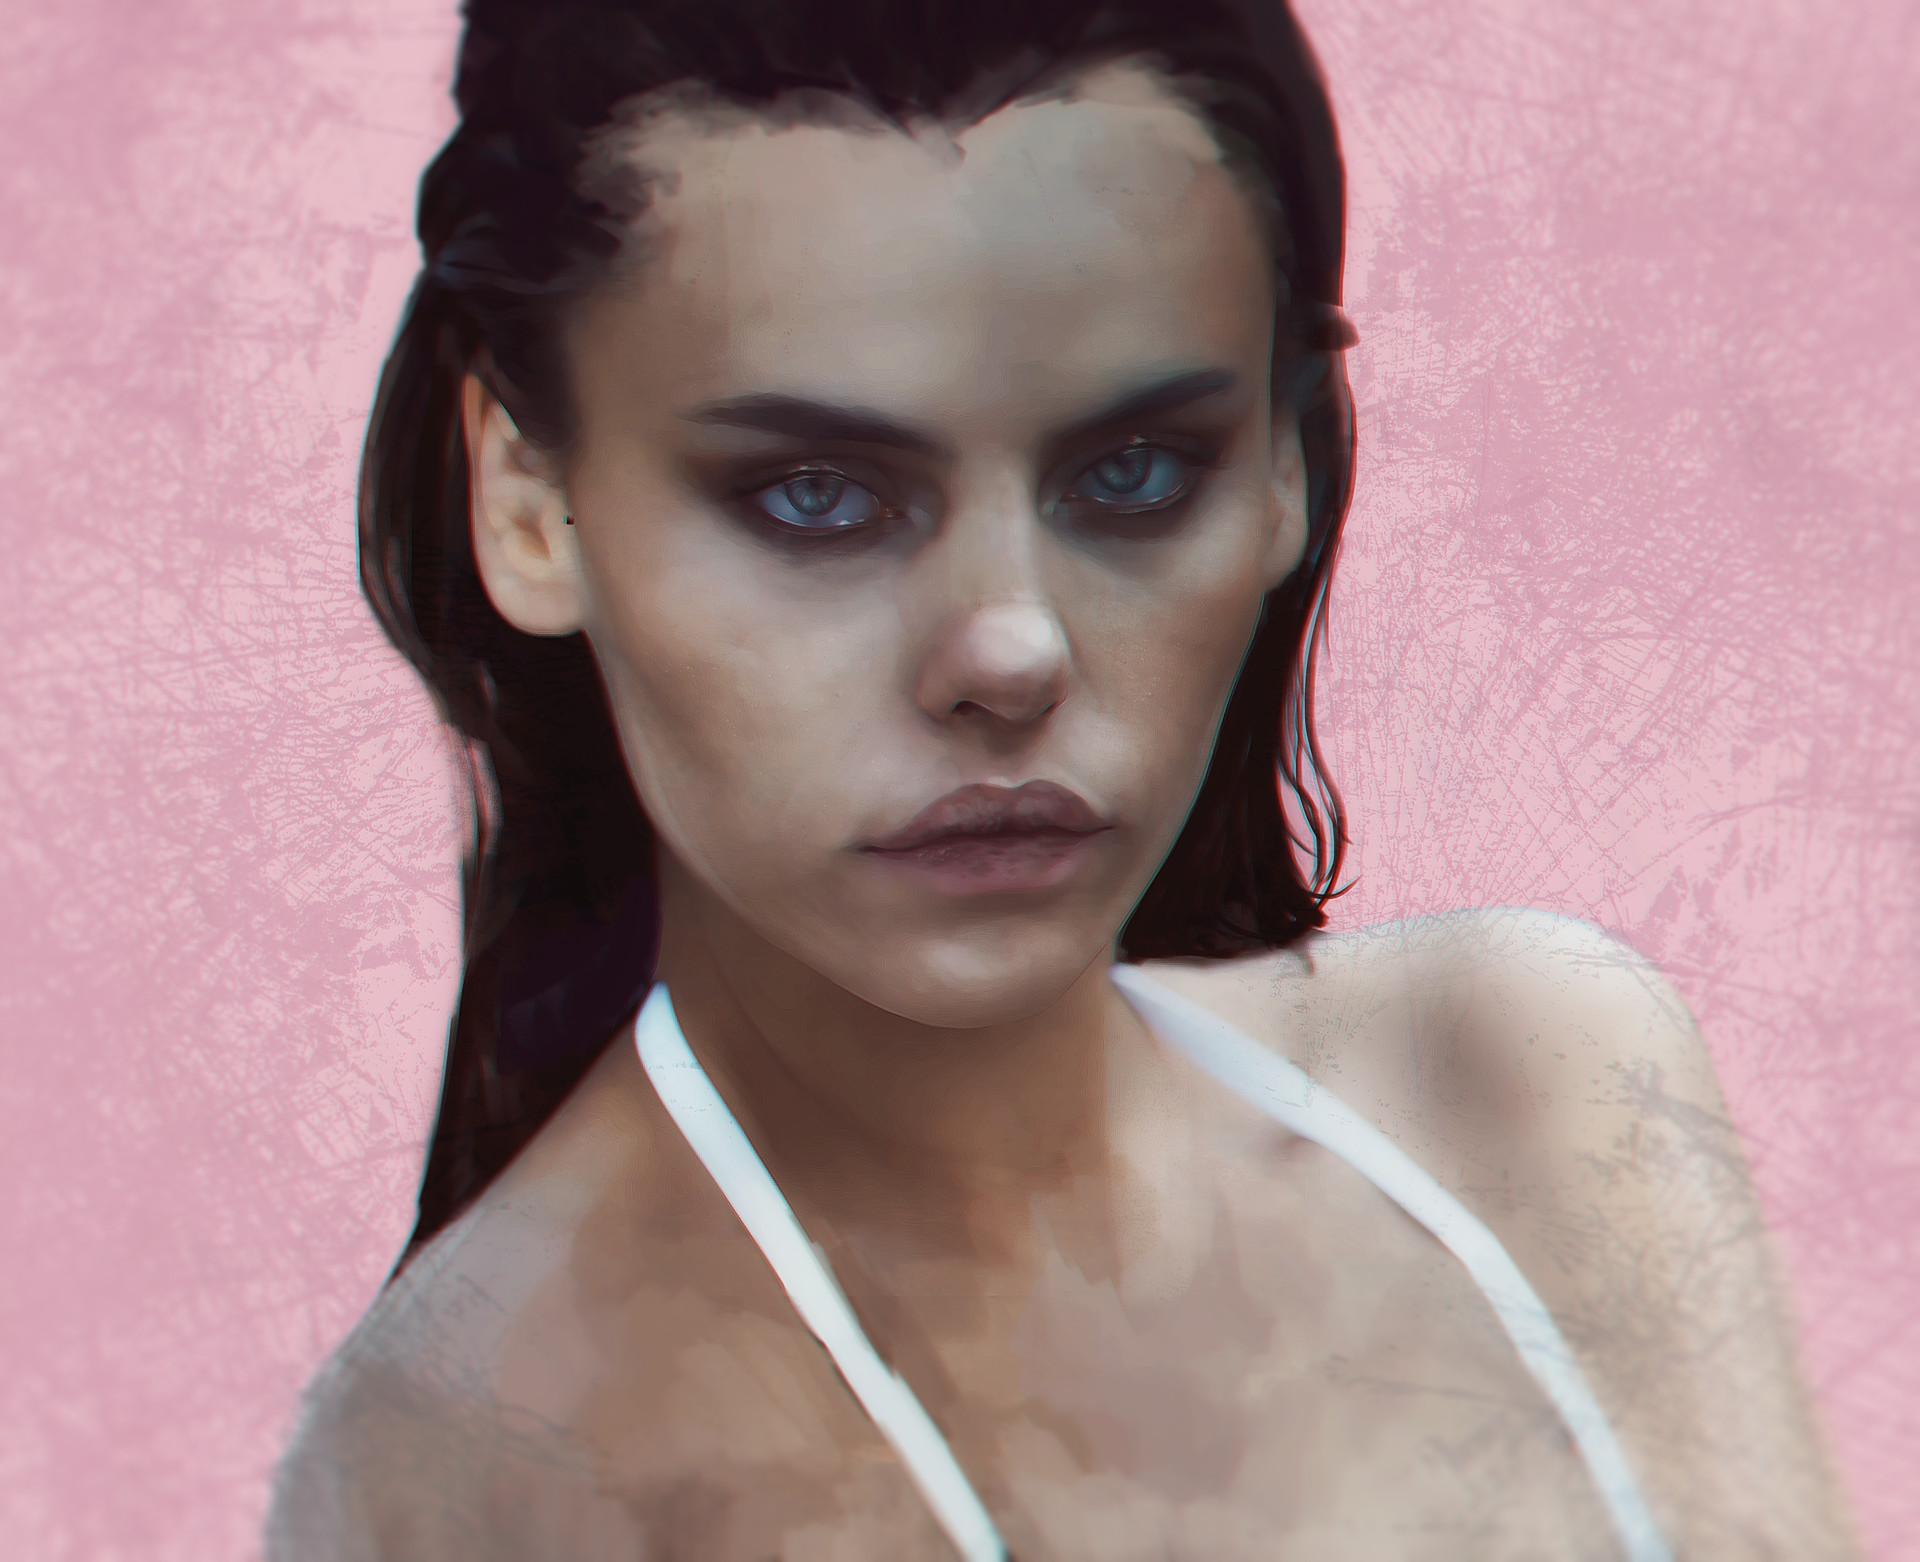 Daniela Freitas nudes (23 foto and video), Pussy, Bikini, Feet, legs 2017